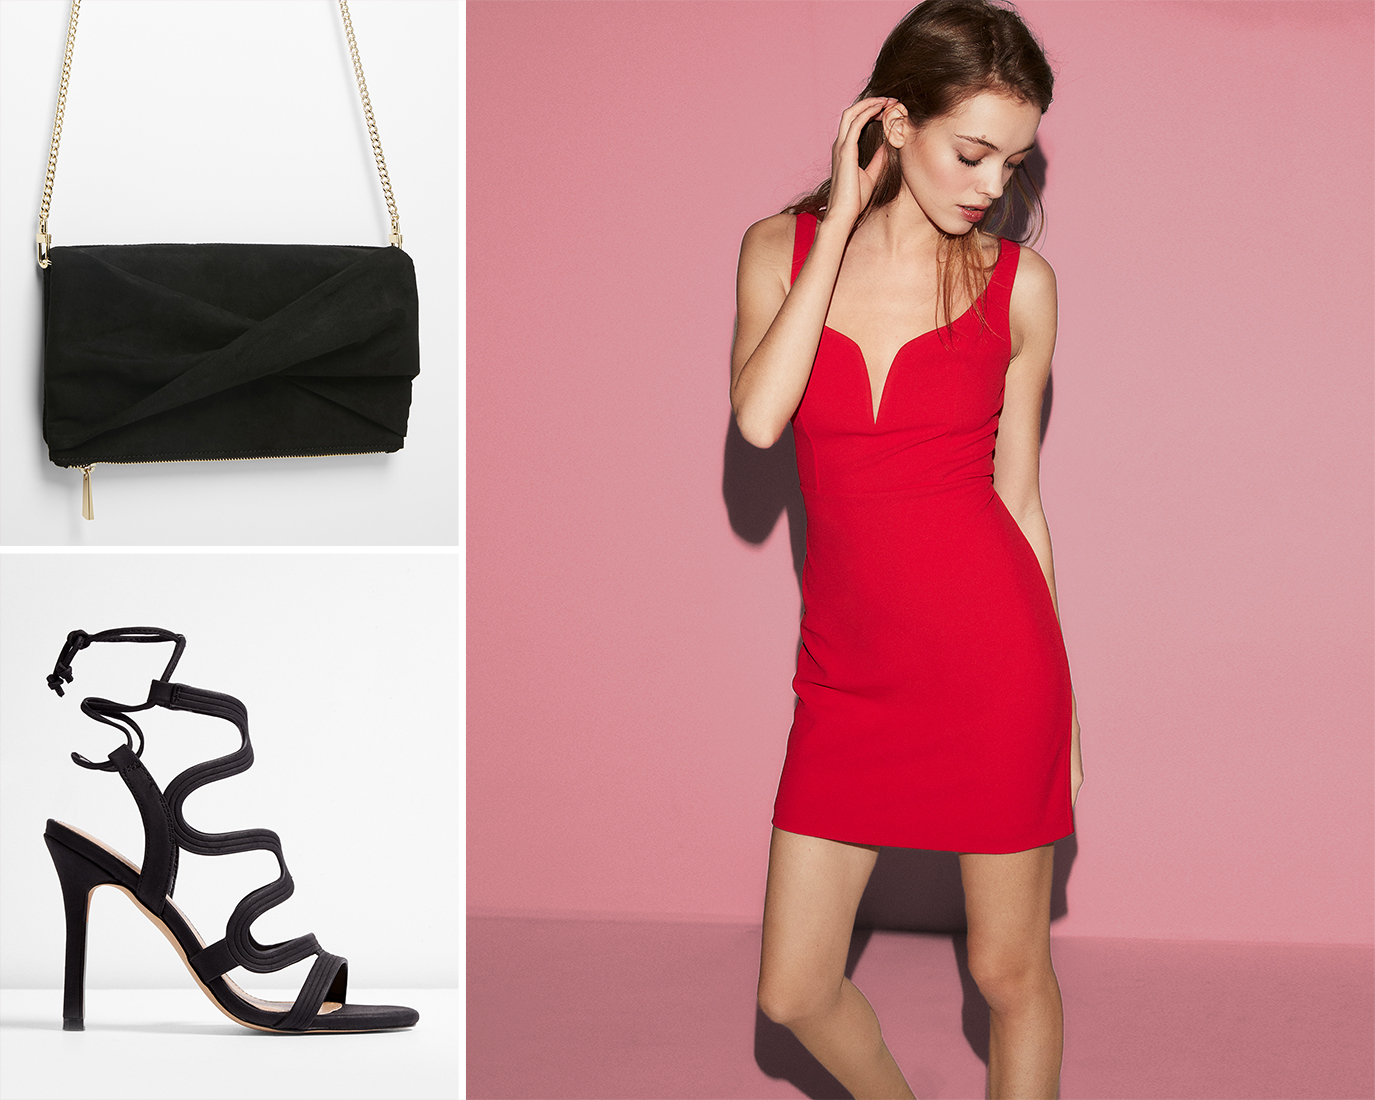 sheath-dress-heeled-sandals-clutch